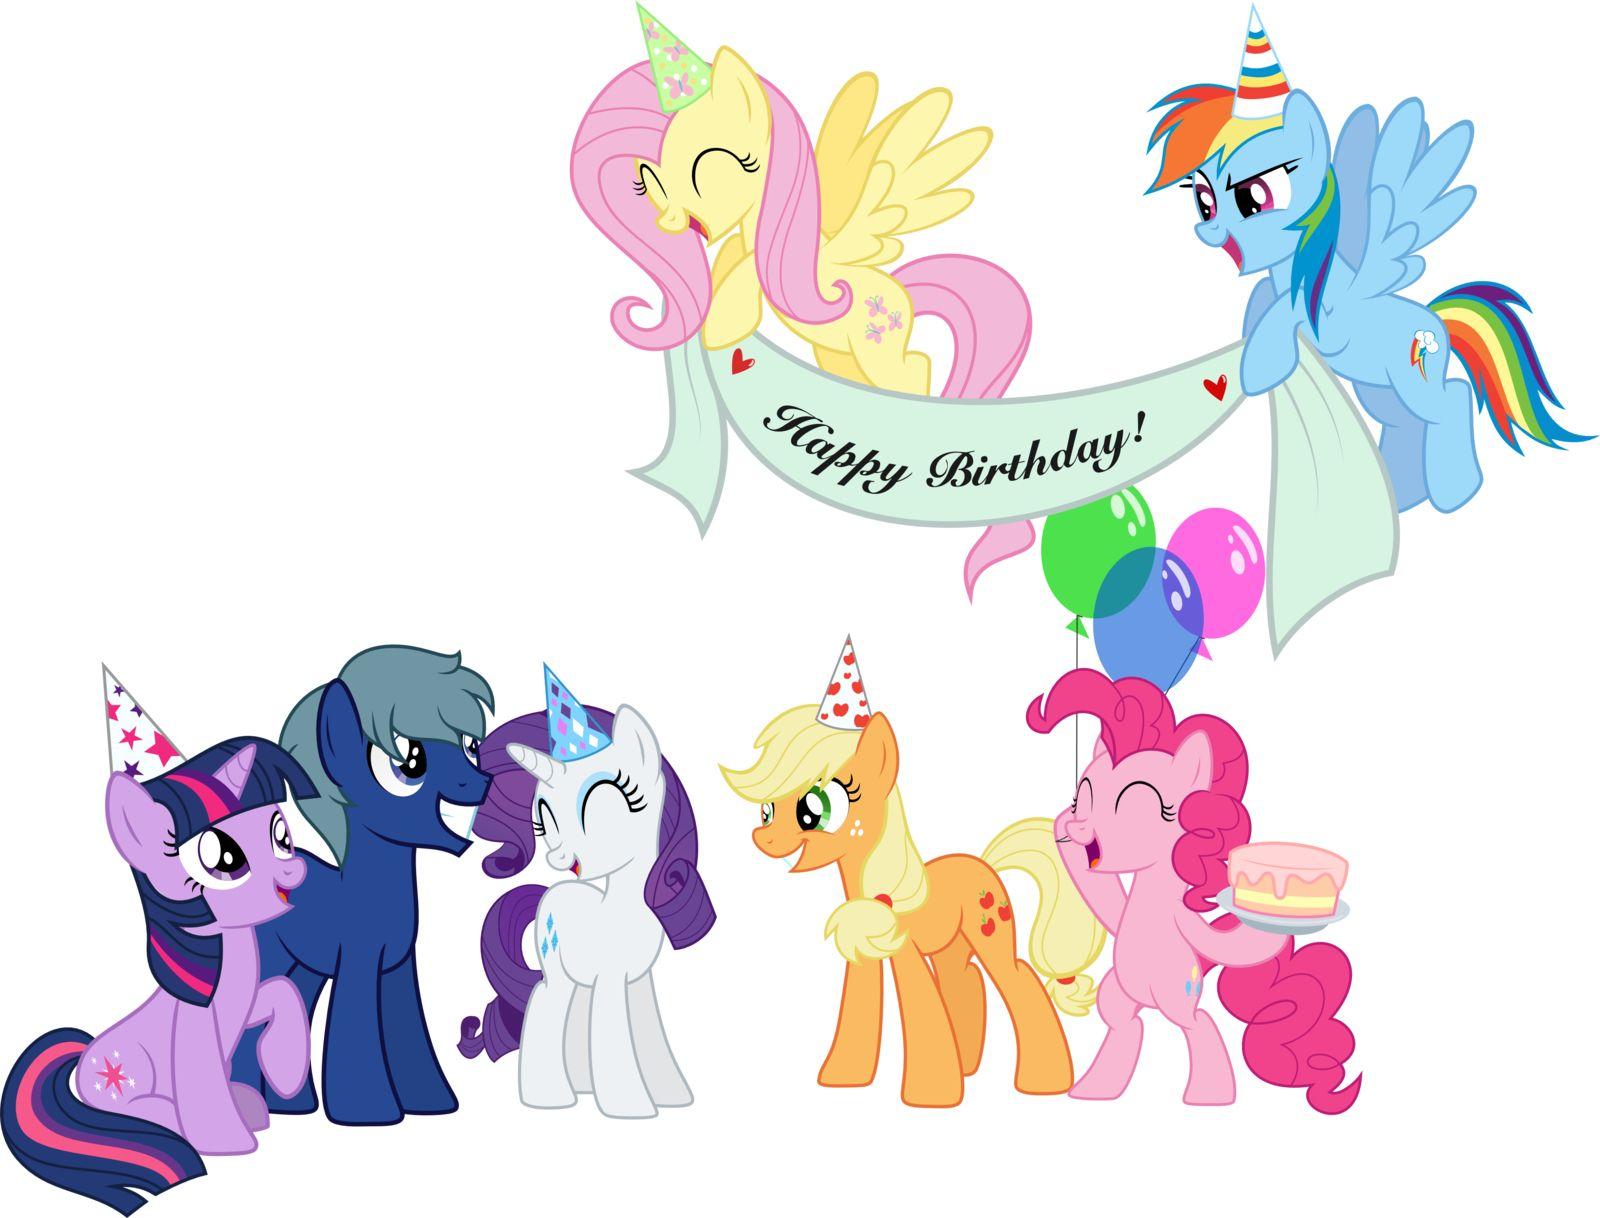 Image From Http Fc06 Deviantart Net Fs70 I 2013 167 D 6 Happy Birthday By Thedarkestdaydream D699f5h P My Little Pony Party Little Pony Party Happy Birthday